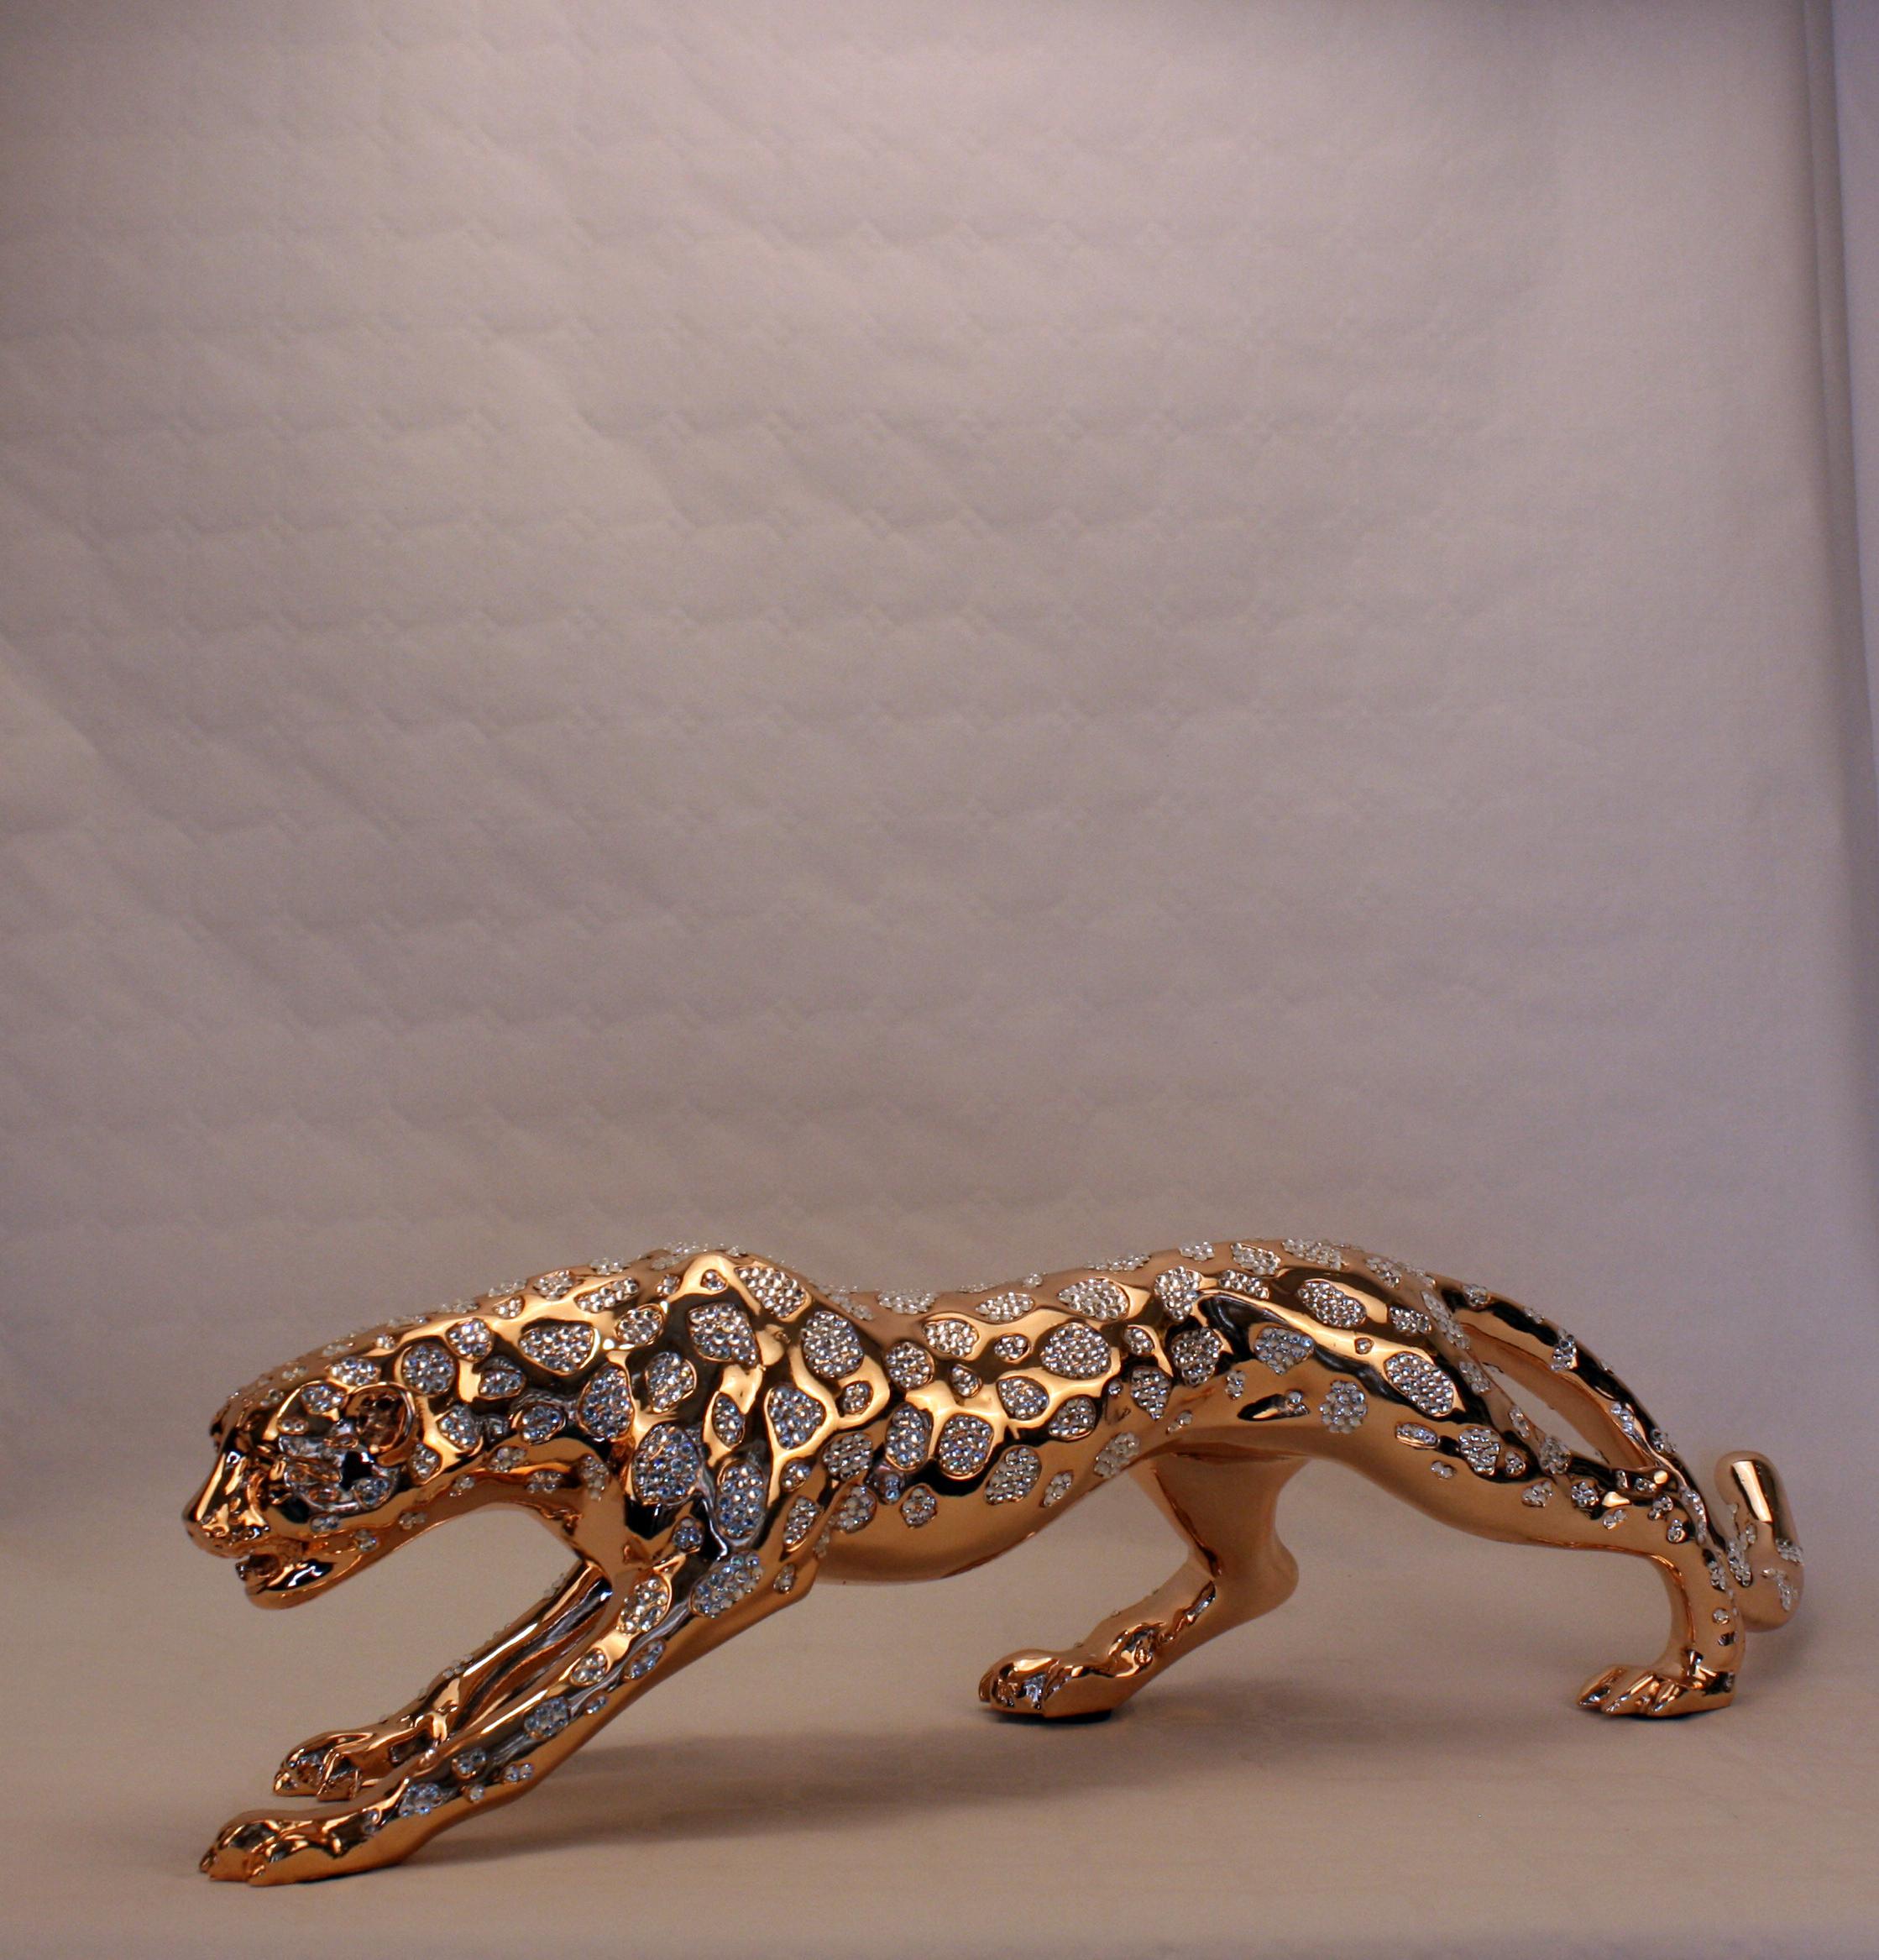 Leopard - Guld med diamanter - Stor - 1